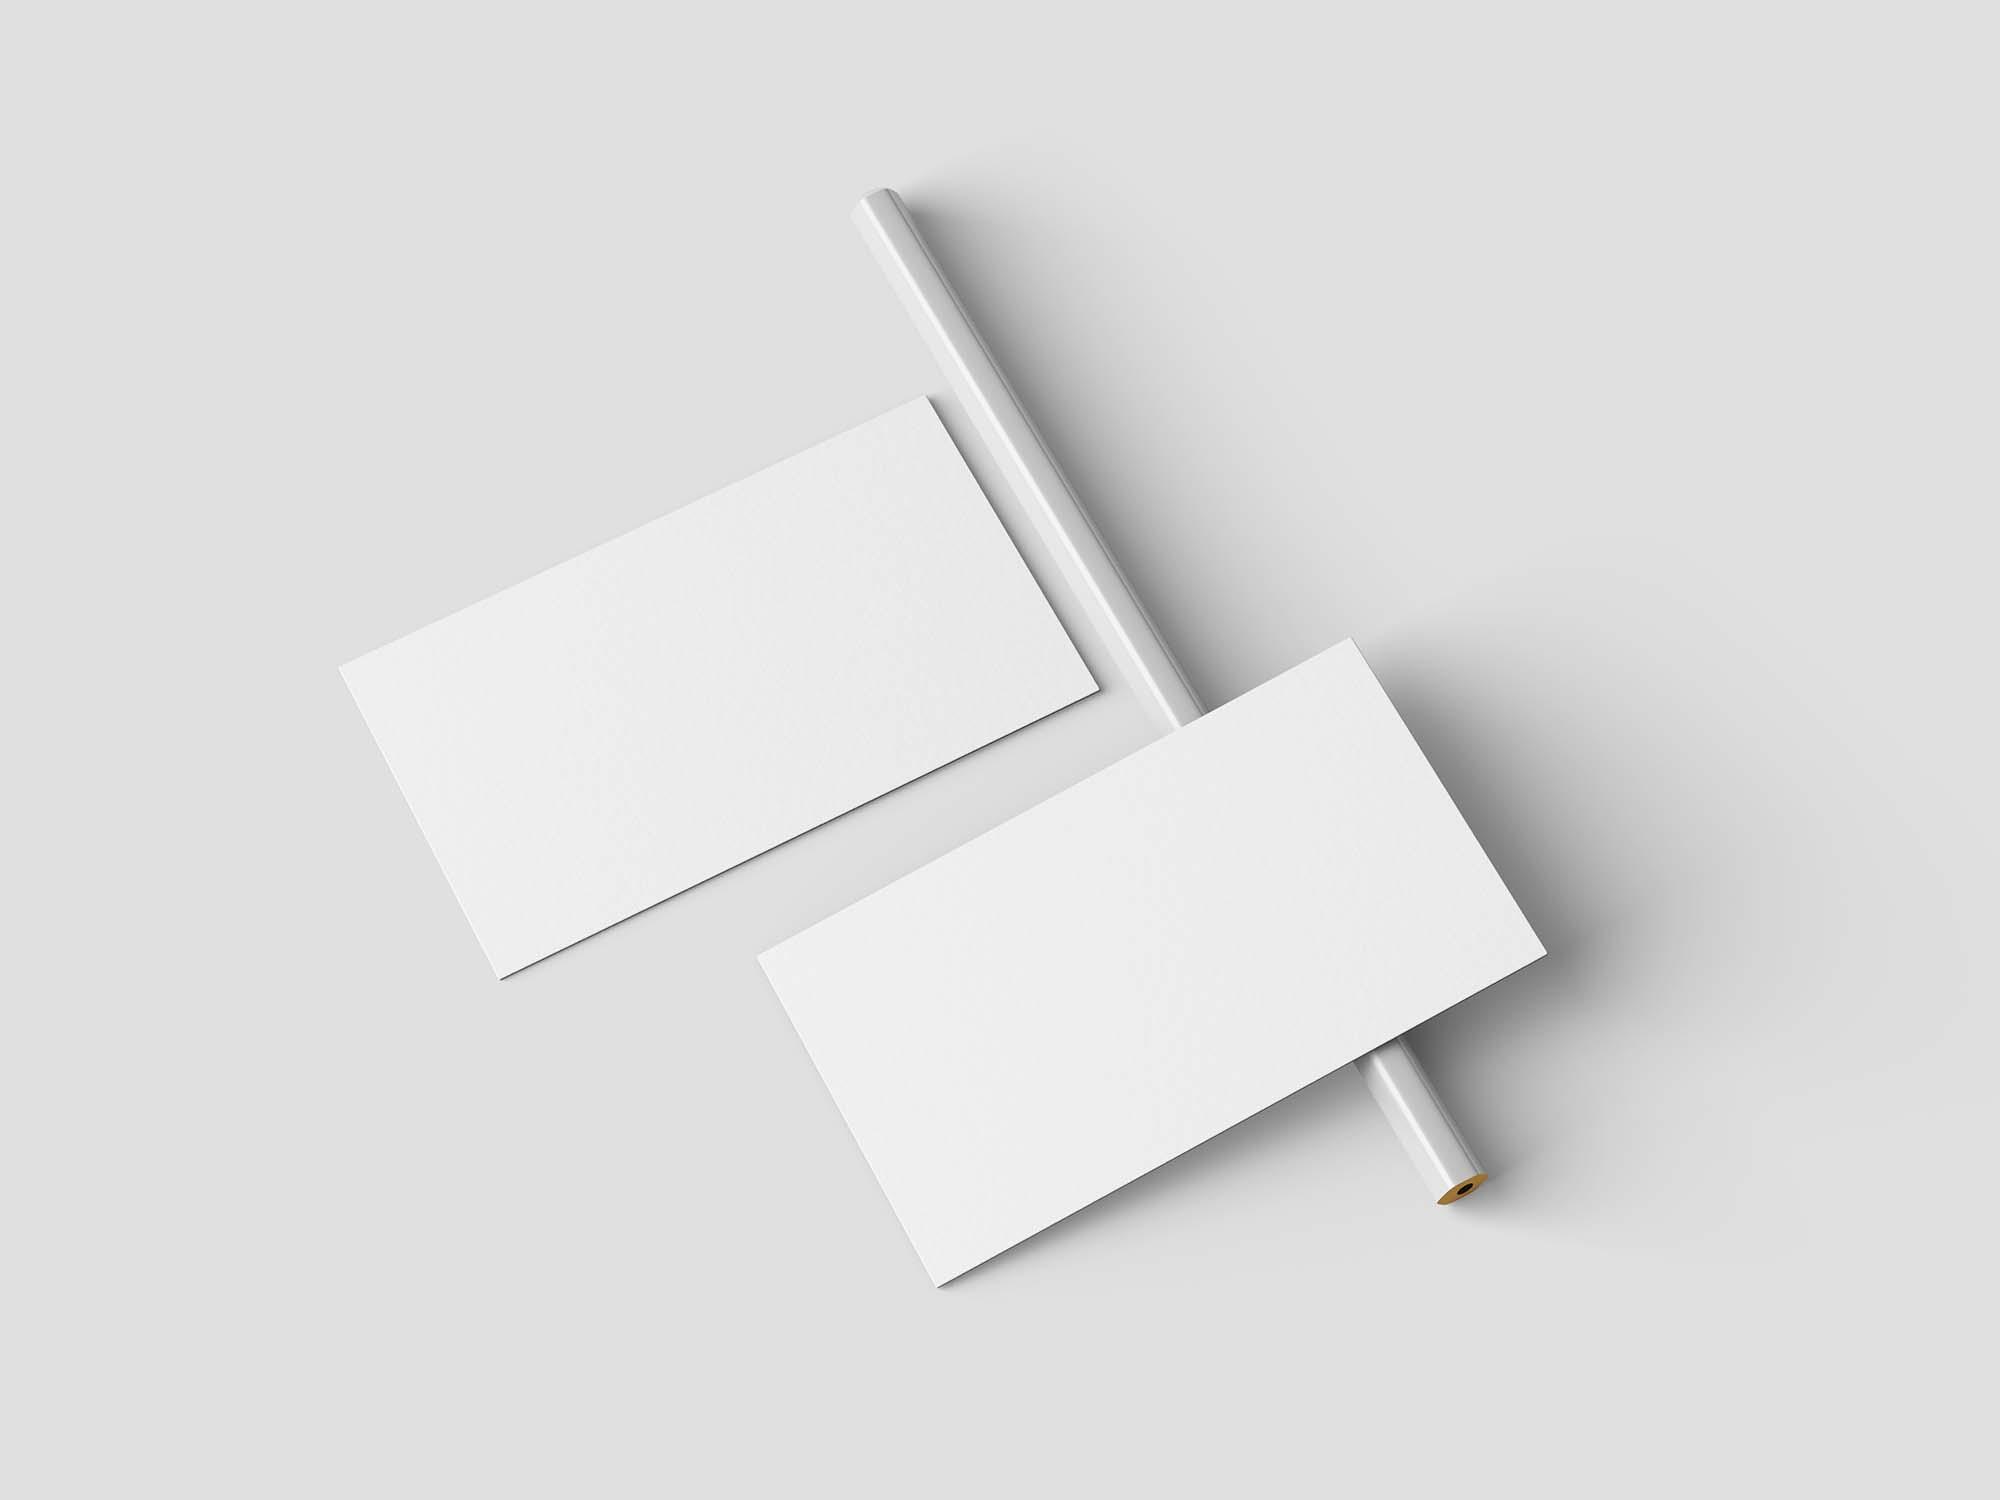 Minimalist Business Card Mockup 3